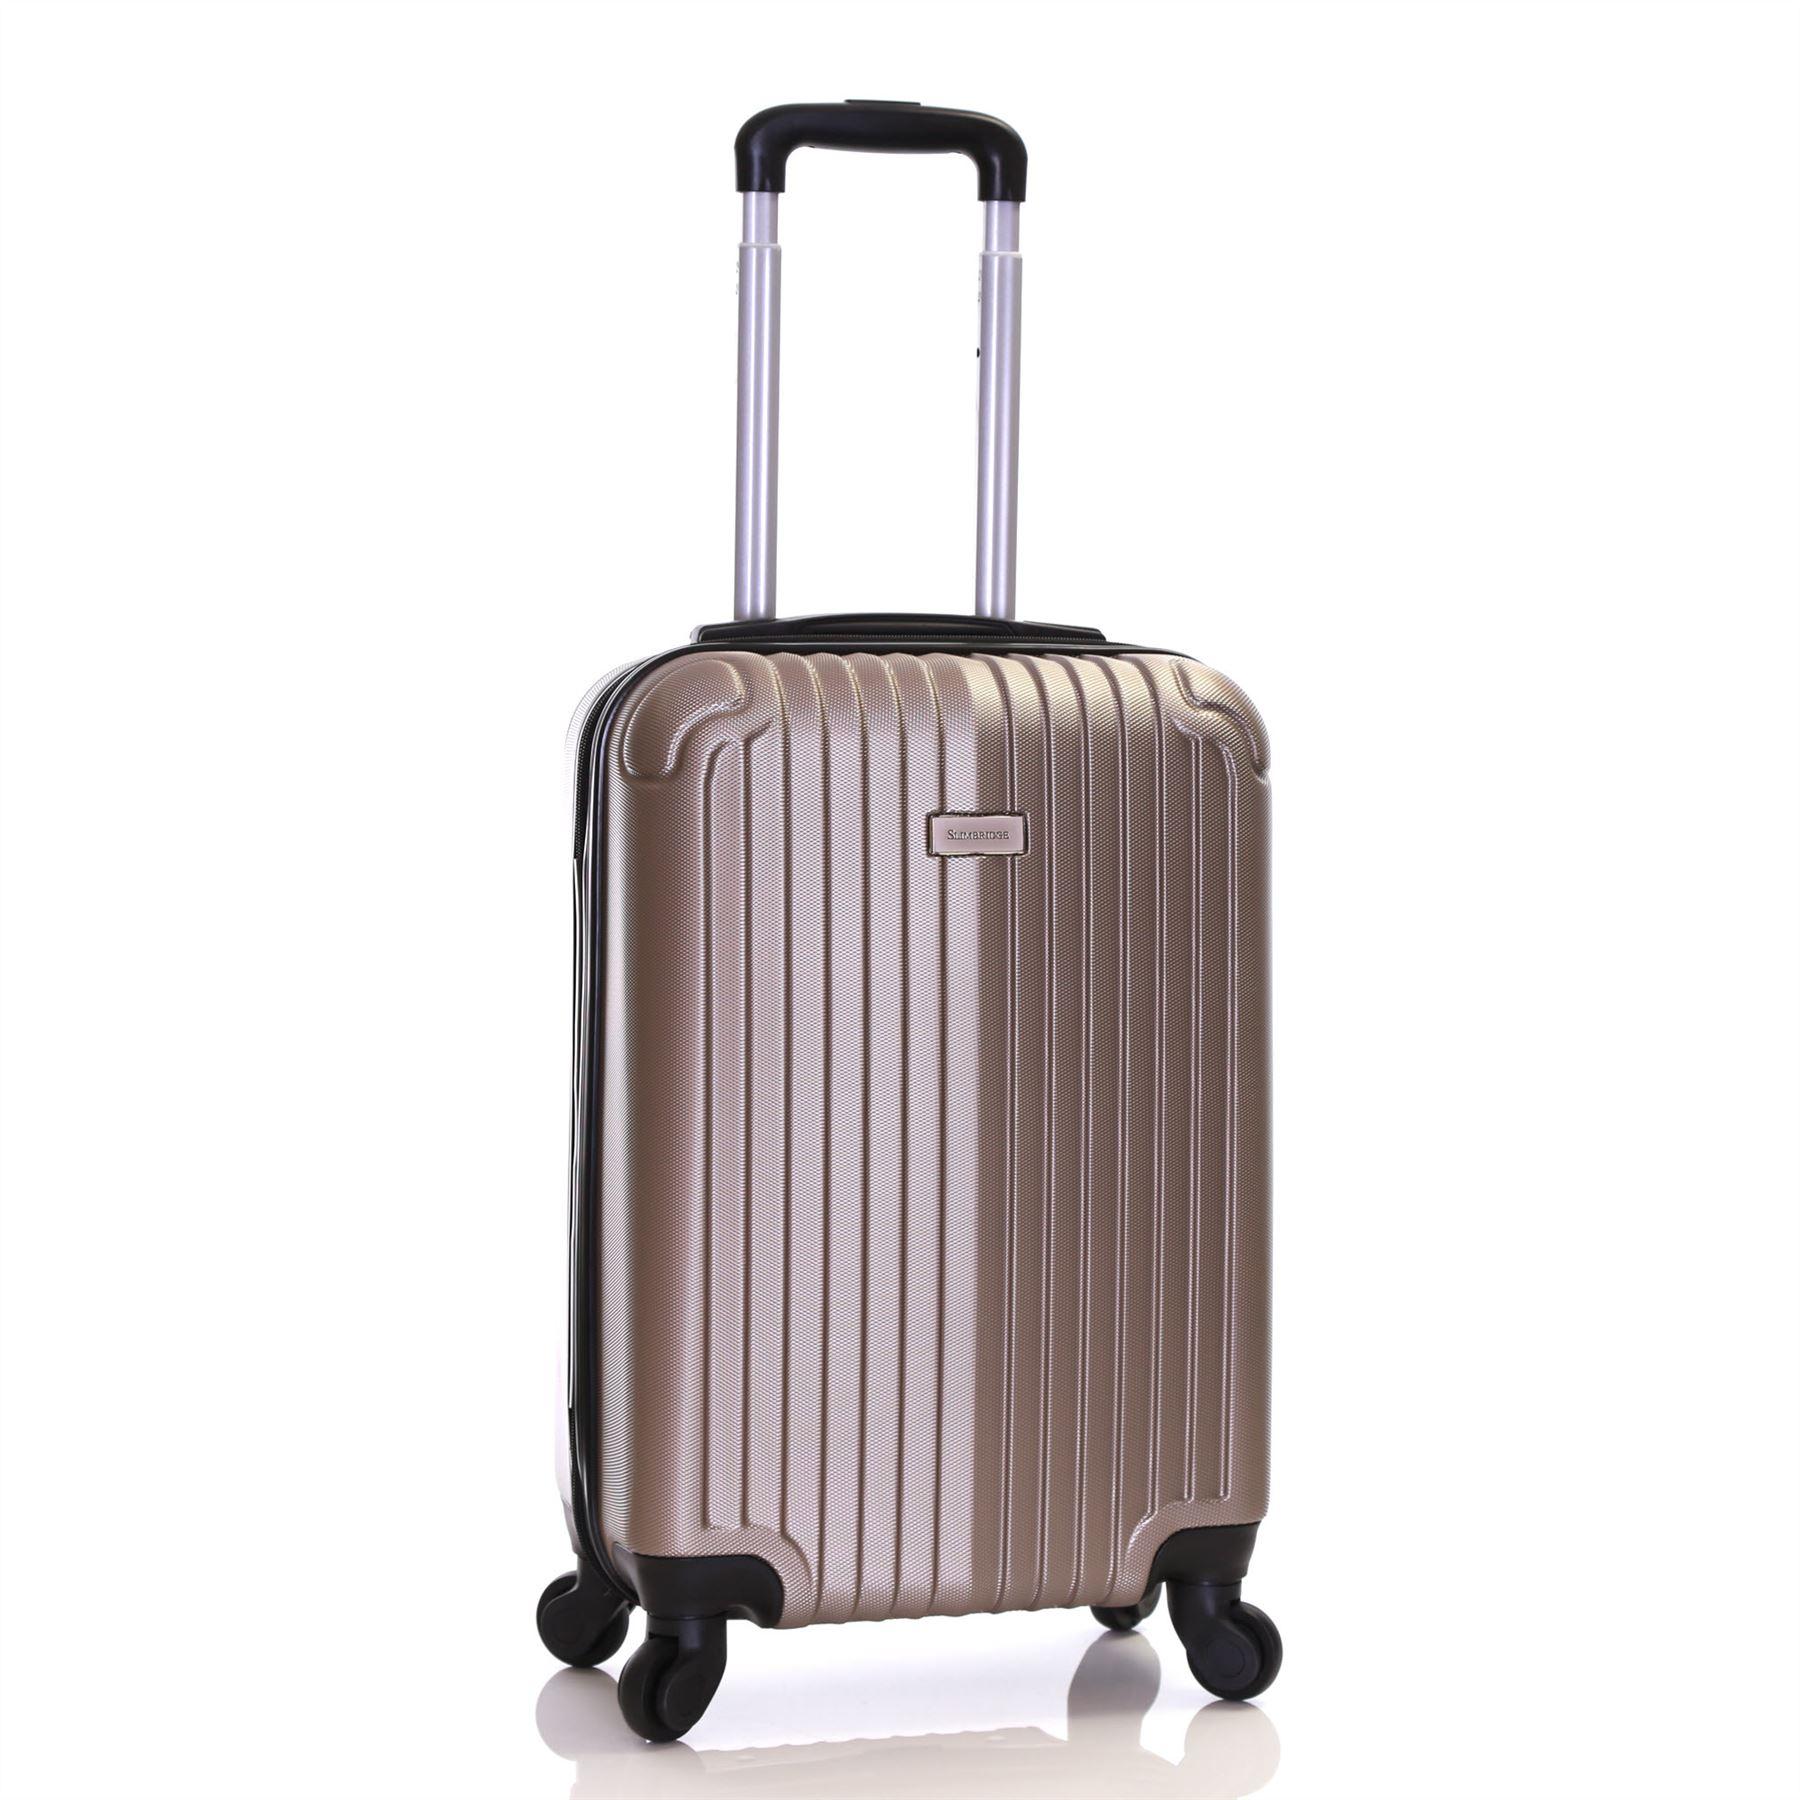 Ryanair EasyJet 55 cm Hard Cabin Approved Spinner Trolley Luggage ...